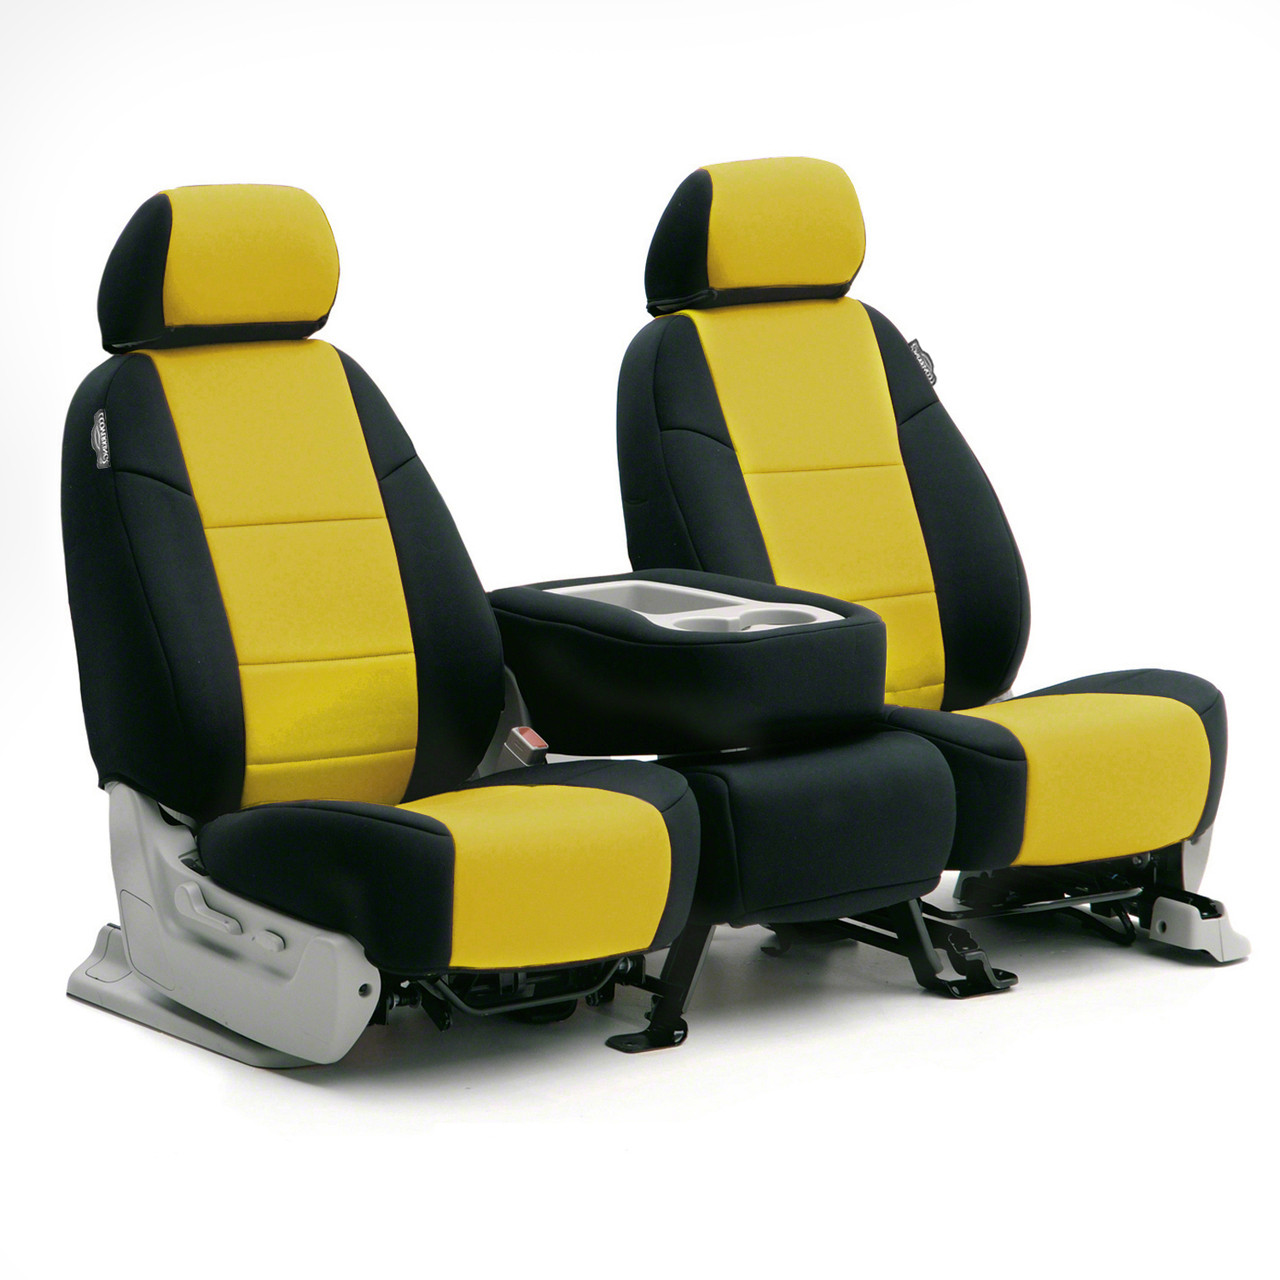 Phenomenal C7 Corvette Neoprene Seat Covers Lamtechconsult Wood Chair Design Ideas Lamtechconsultcom